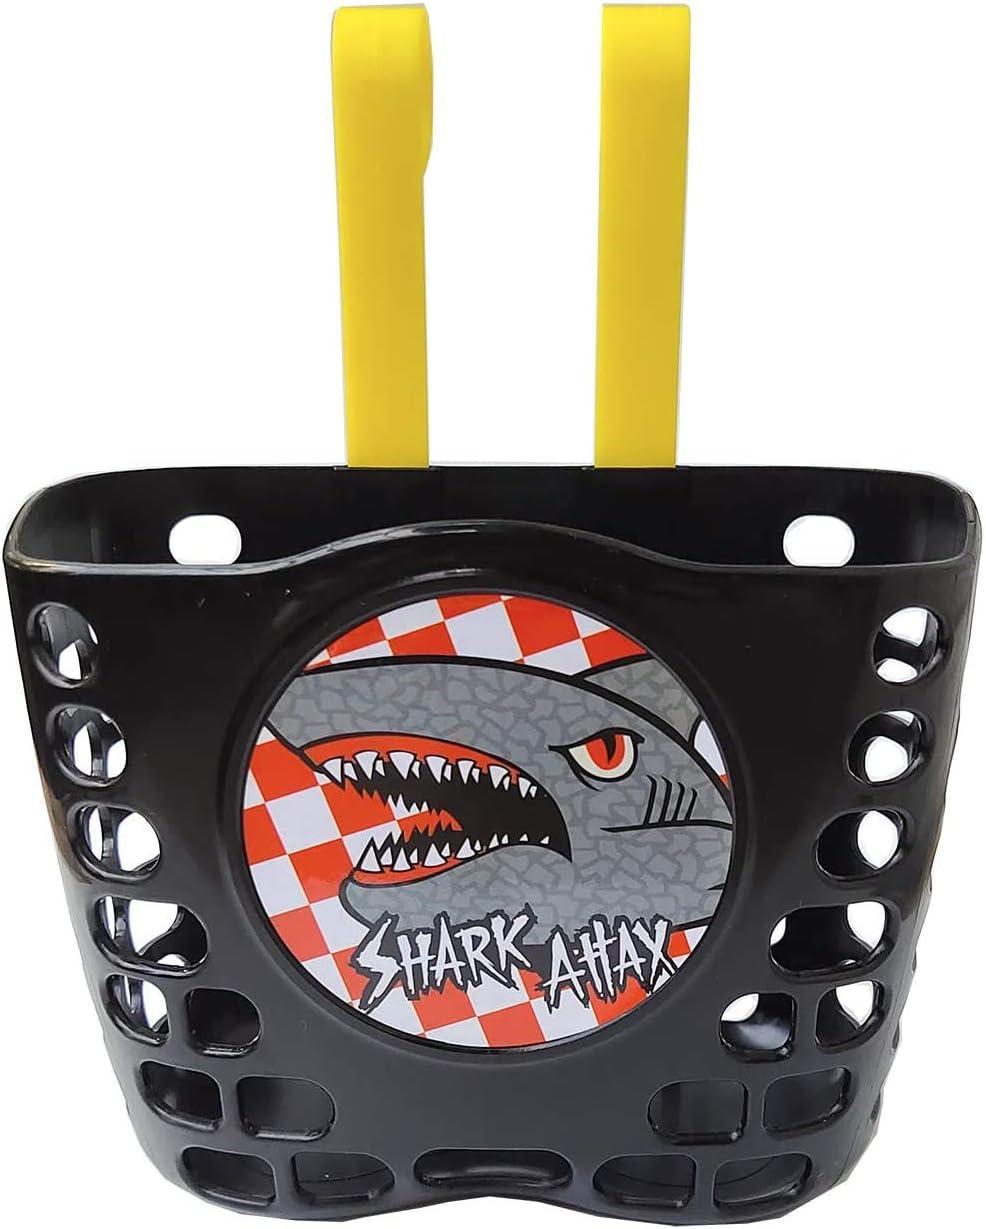 Freefish Kid's Bike Basket Front Cute In Bombing new work stock Handl Pattern Shark